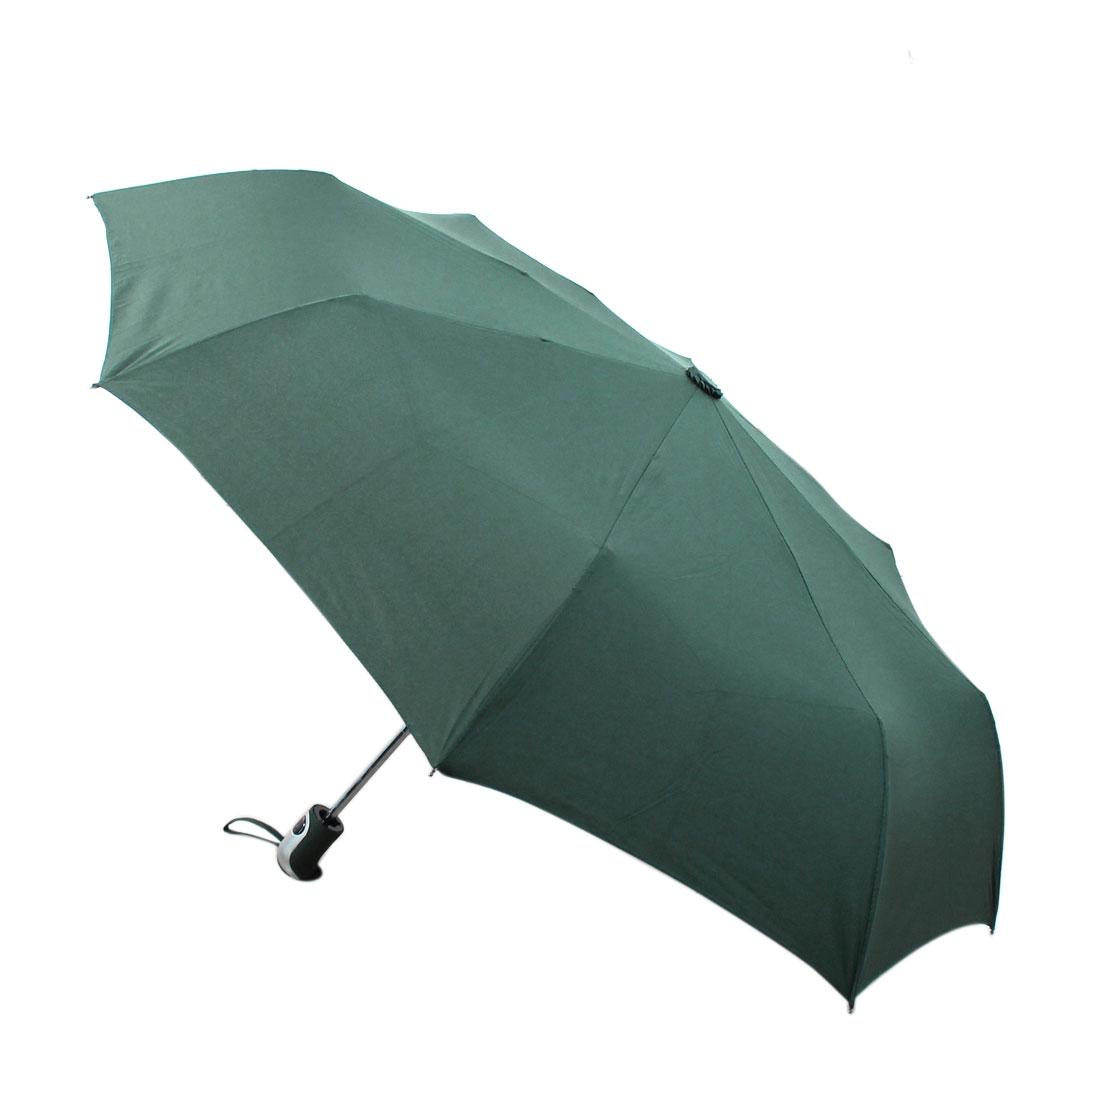 Automatic Open Close Folding Compact Umbrella 97cm Dia Green